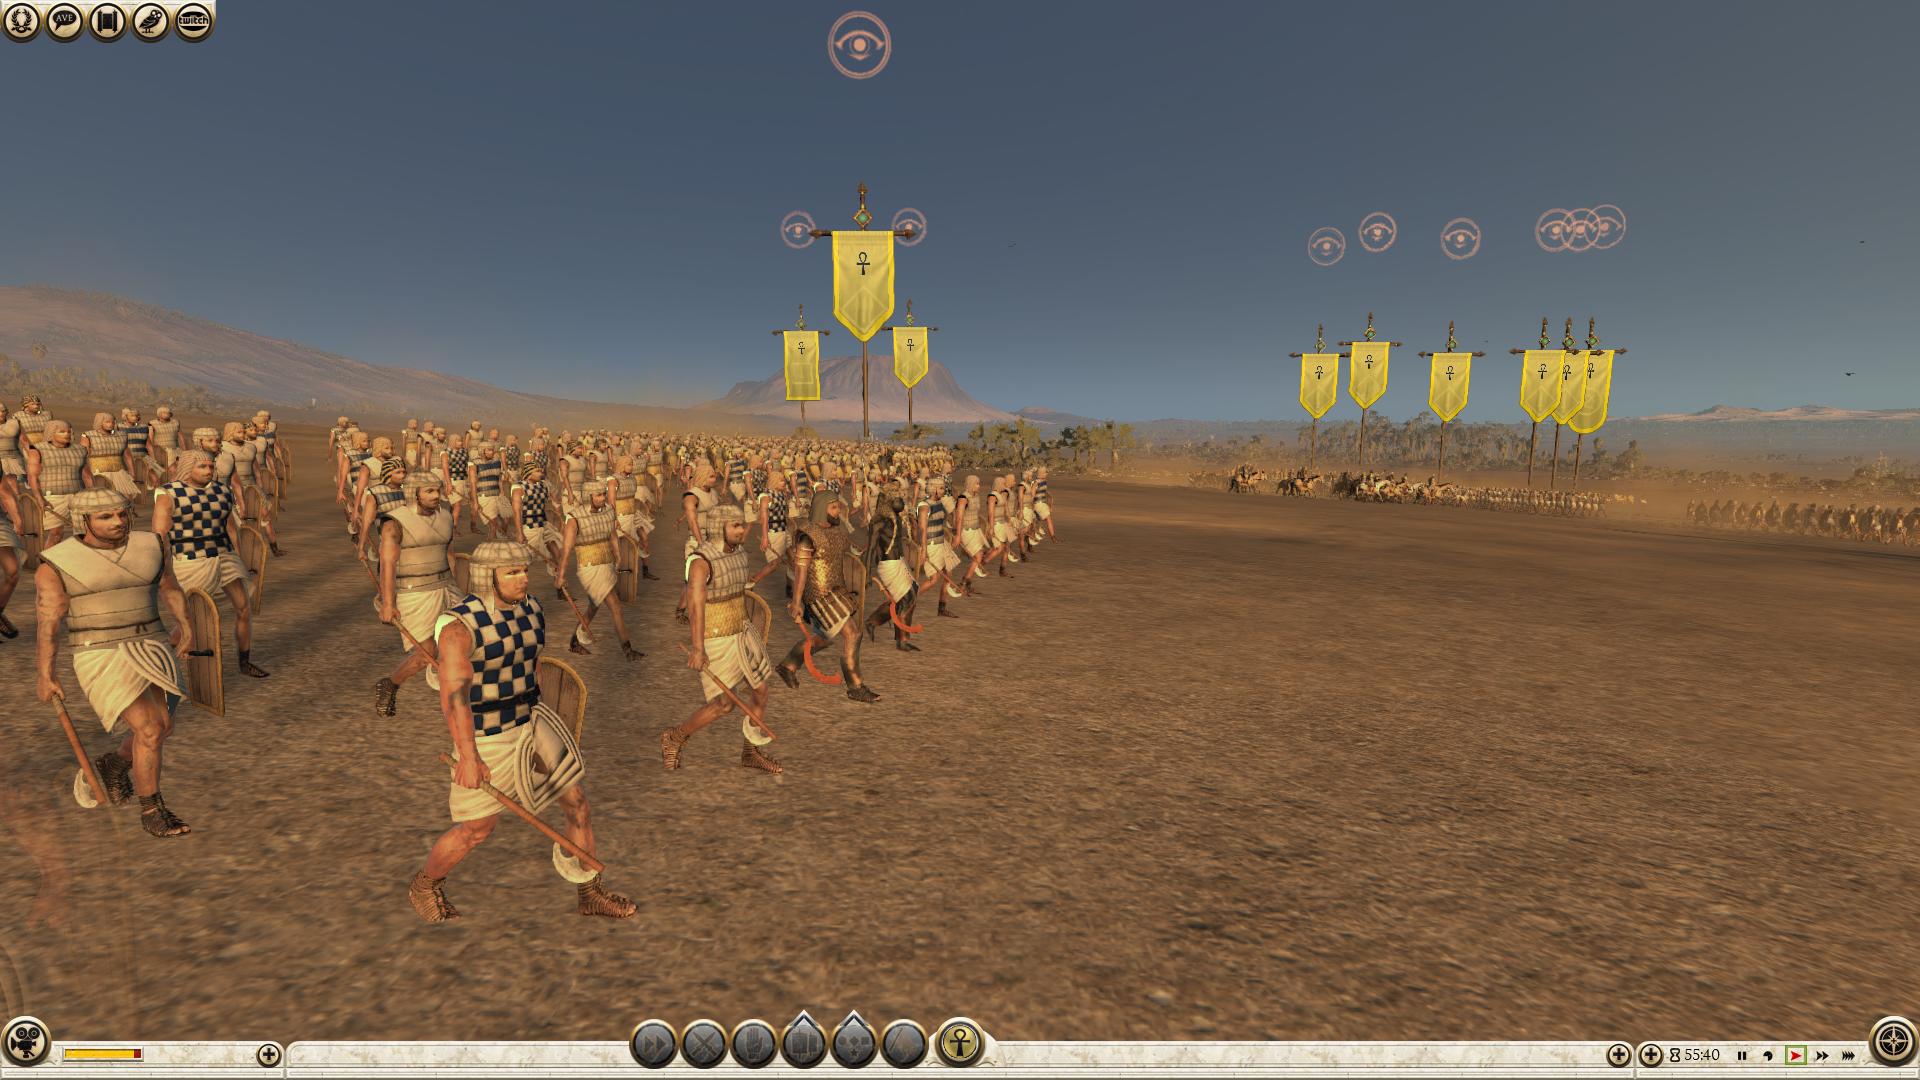 Total_War_ROME_2_12_15_2016_10_17_52_PM.